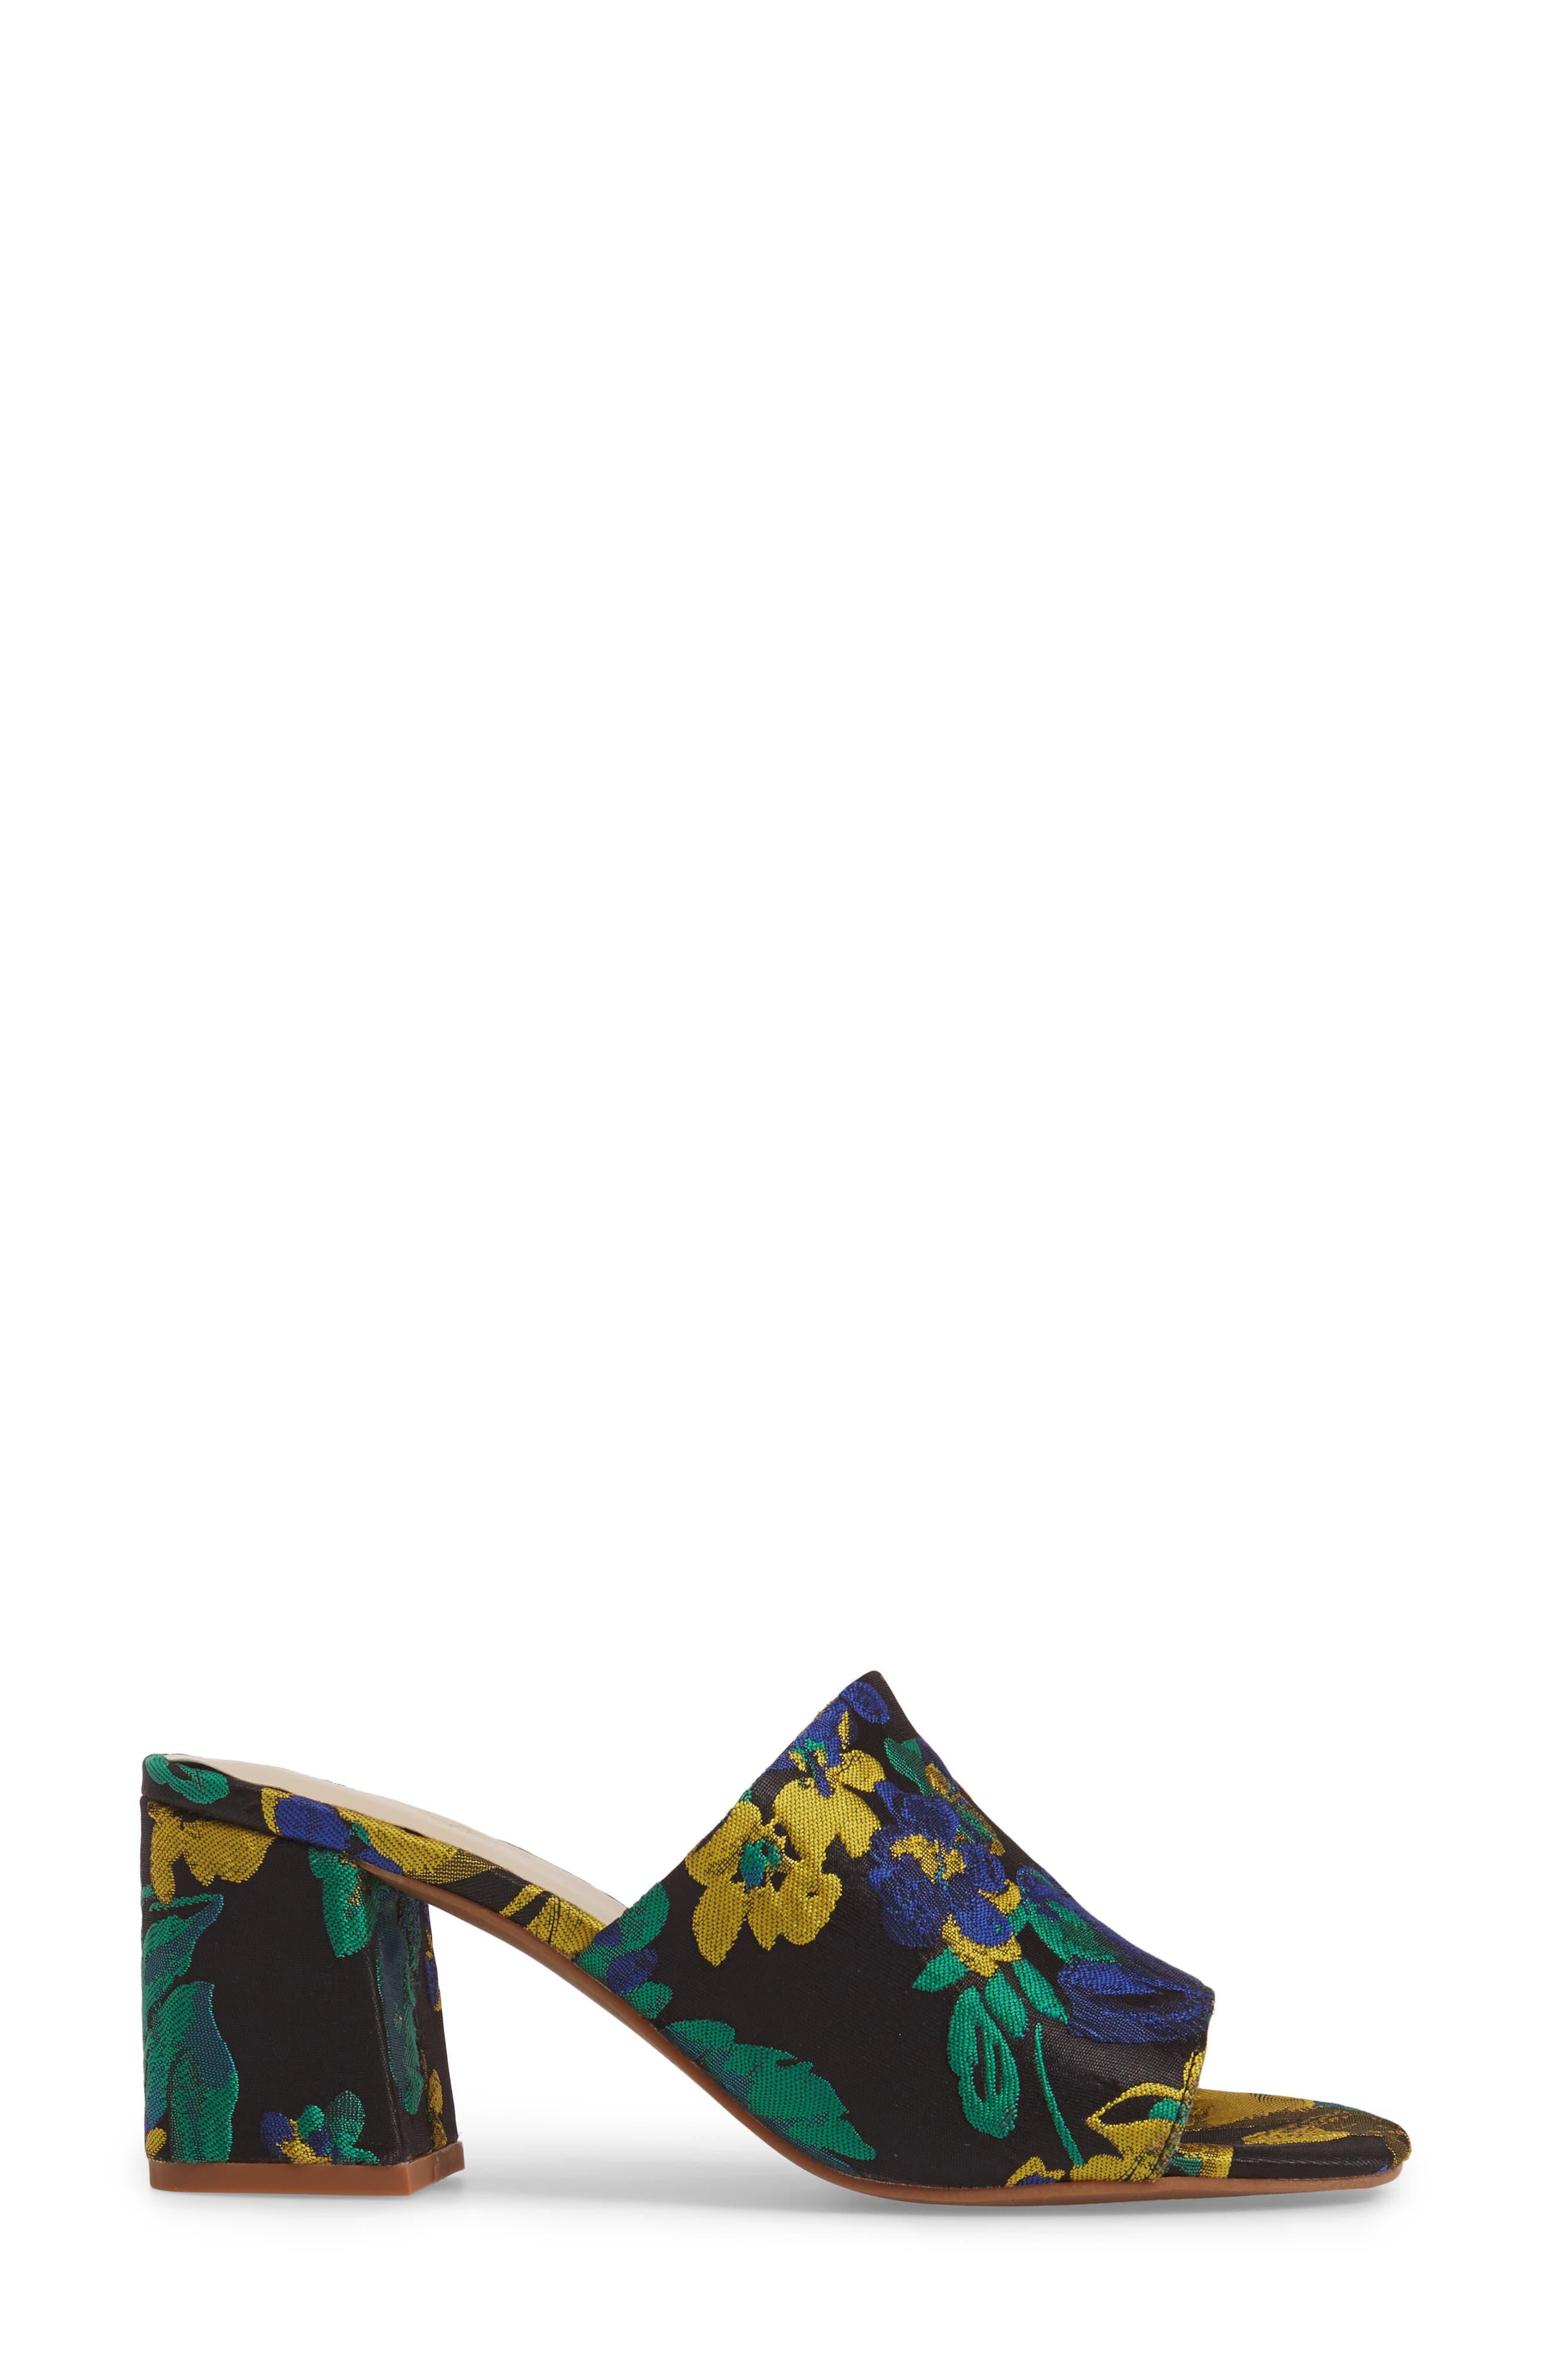 Commute Floral Flared Heel Sandal,                             Alternate thumbnail 3, color,                             002